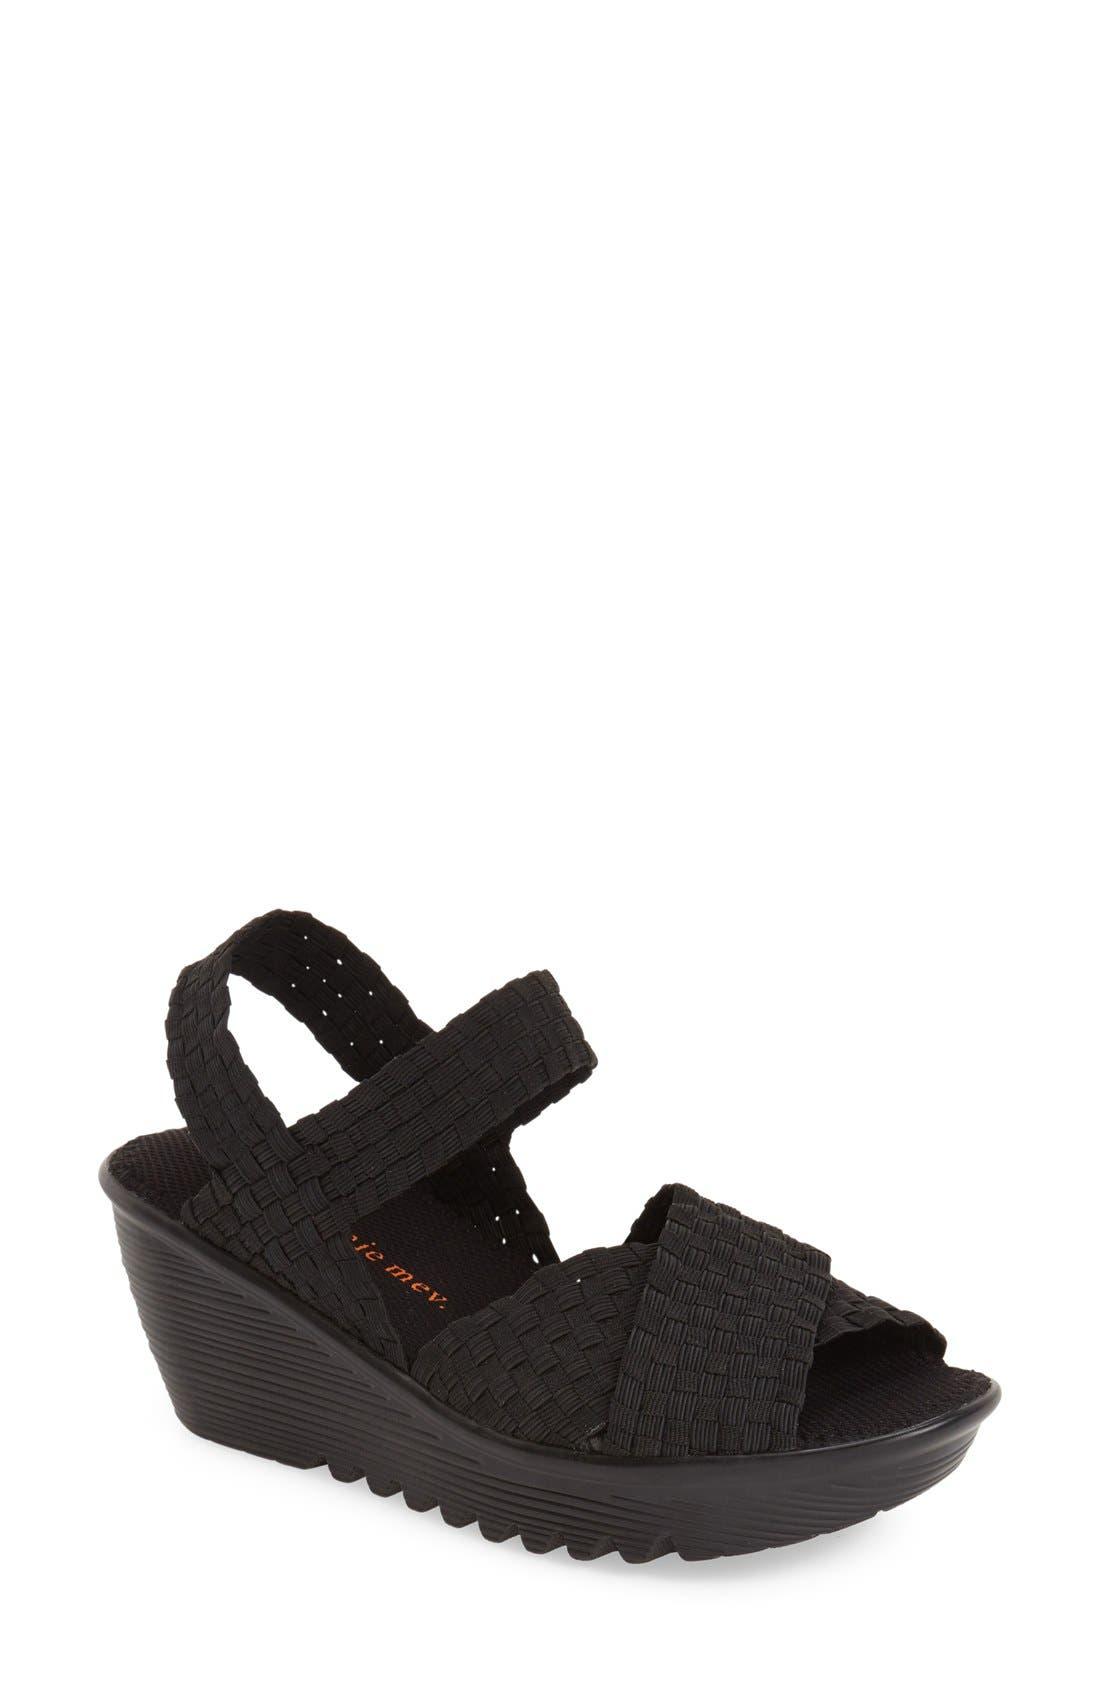 bernie mev. 'Buttercup' Woven Platform Wedge Sandal (Women)